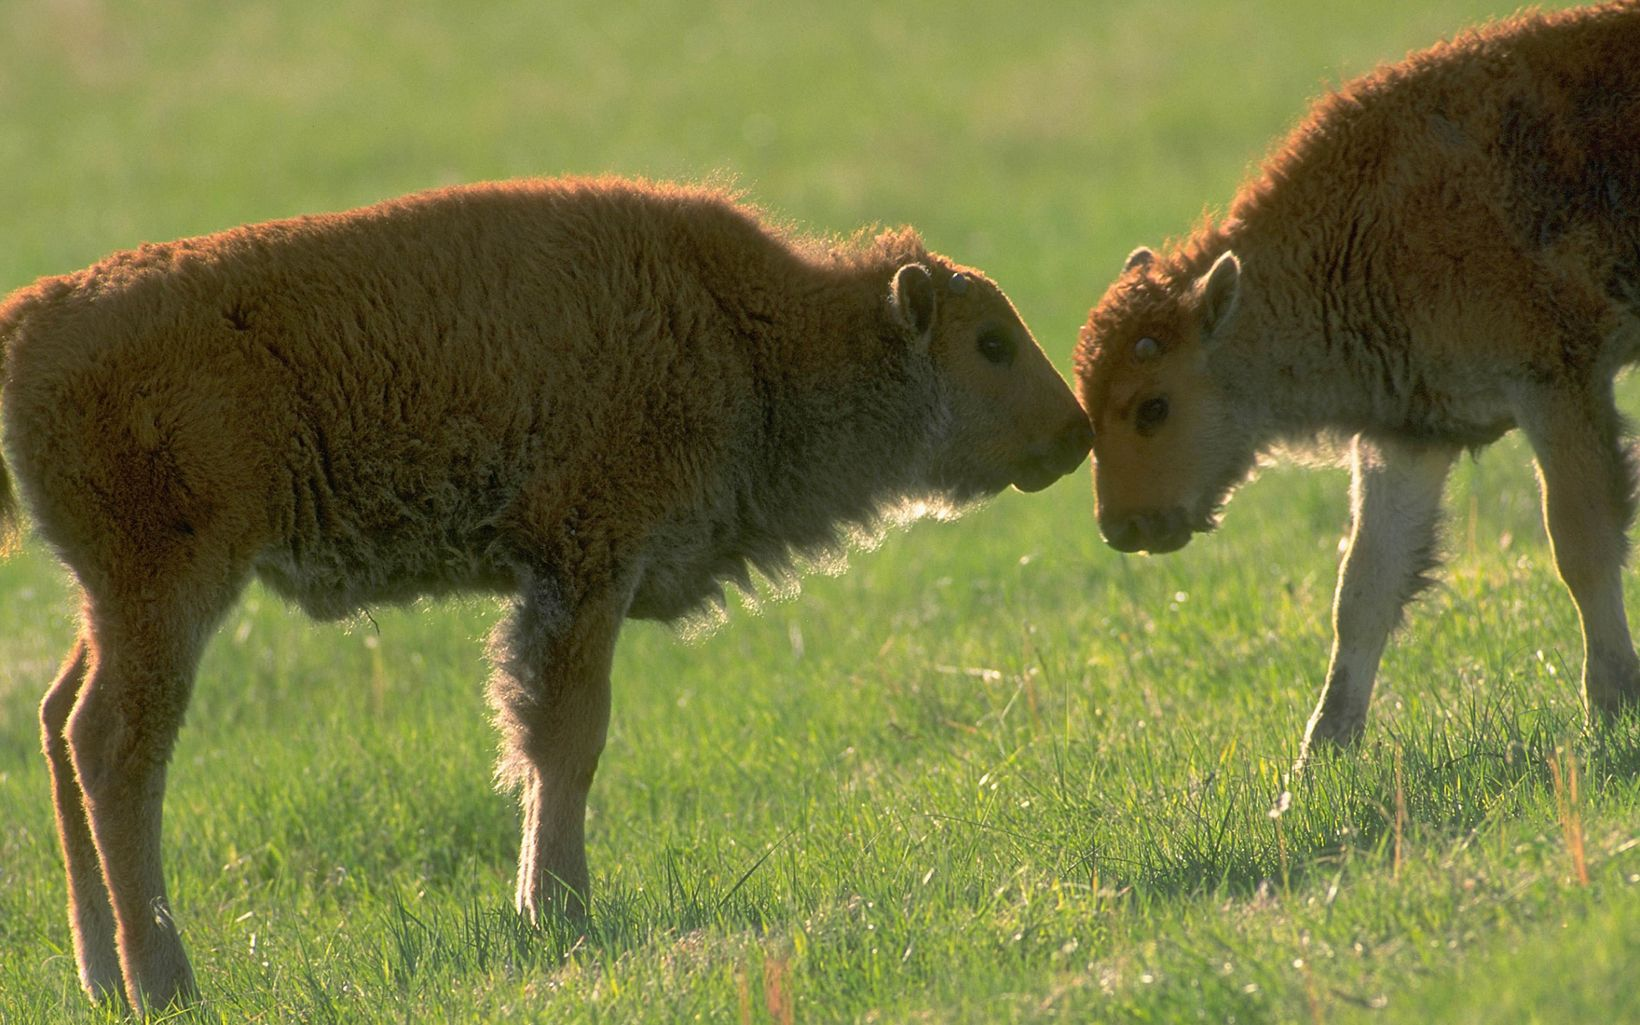 Bison calves at Tallgrass Prairie Preserve.